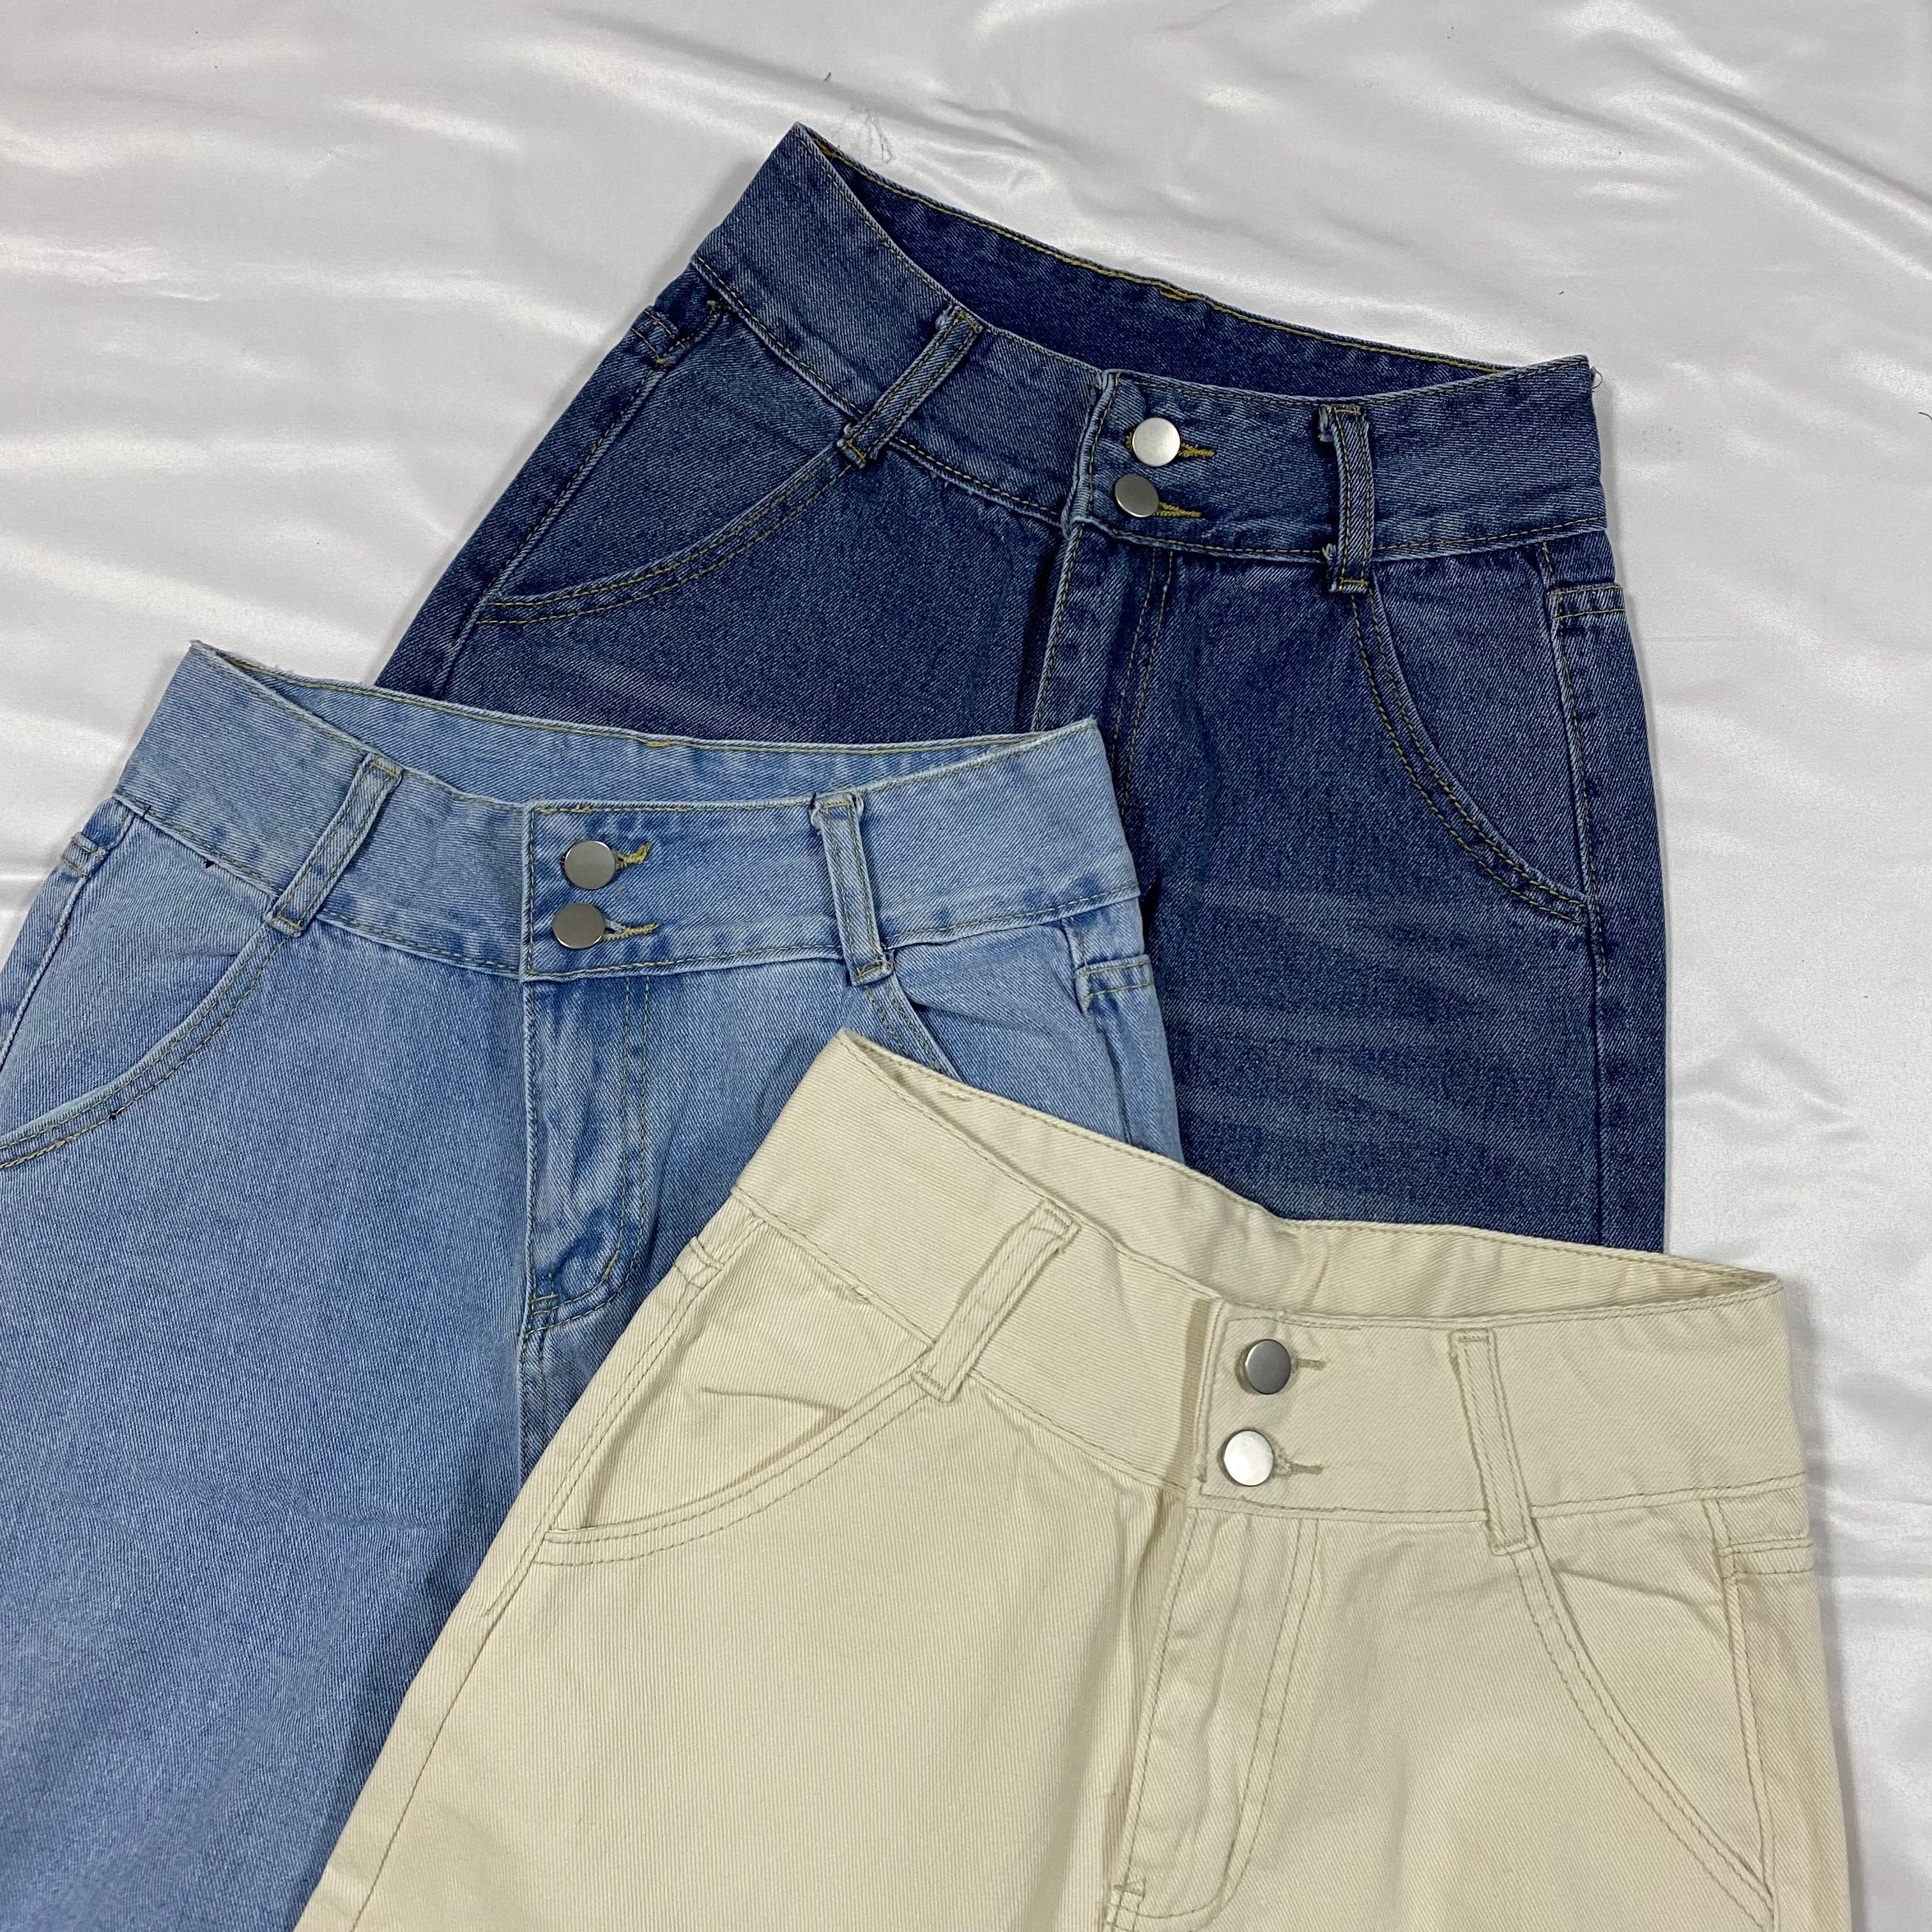 two button high waist pants[2104-28]